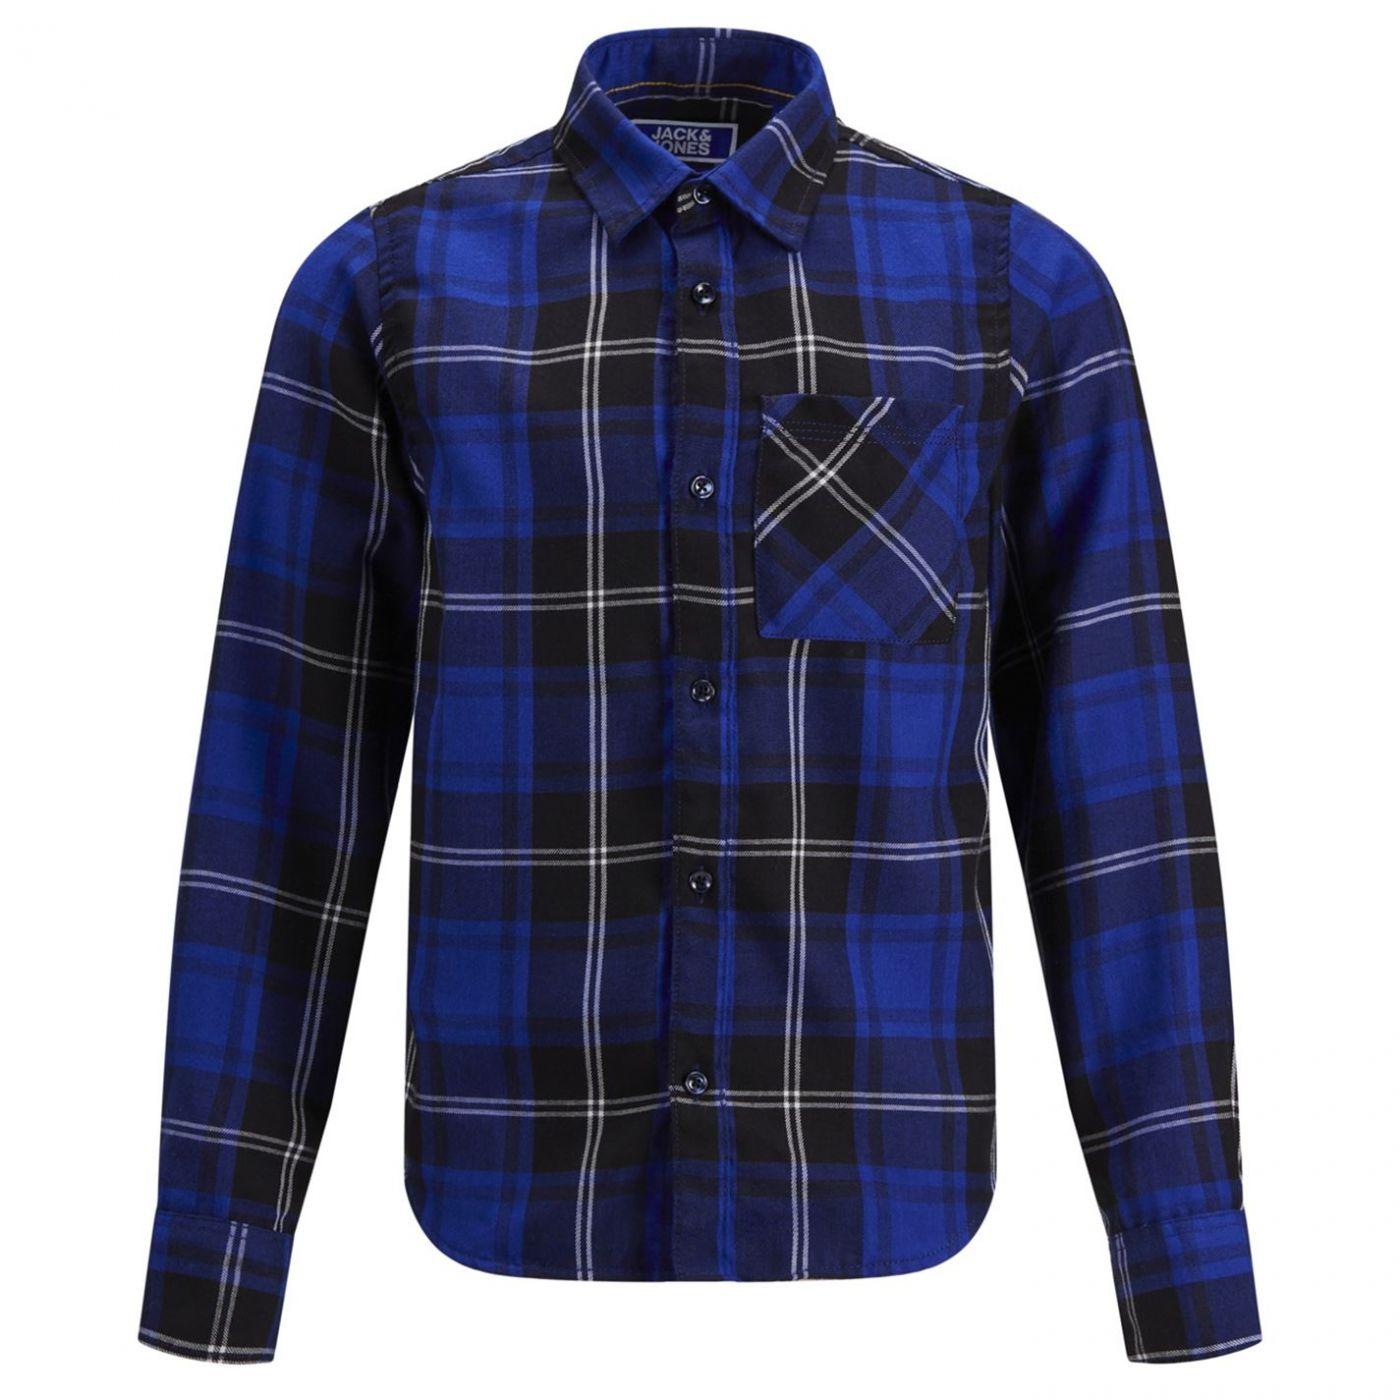 Jack and Jones Junior Colby Check Shirt